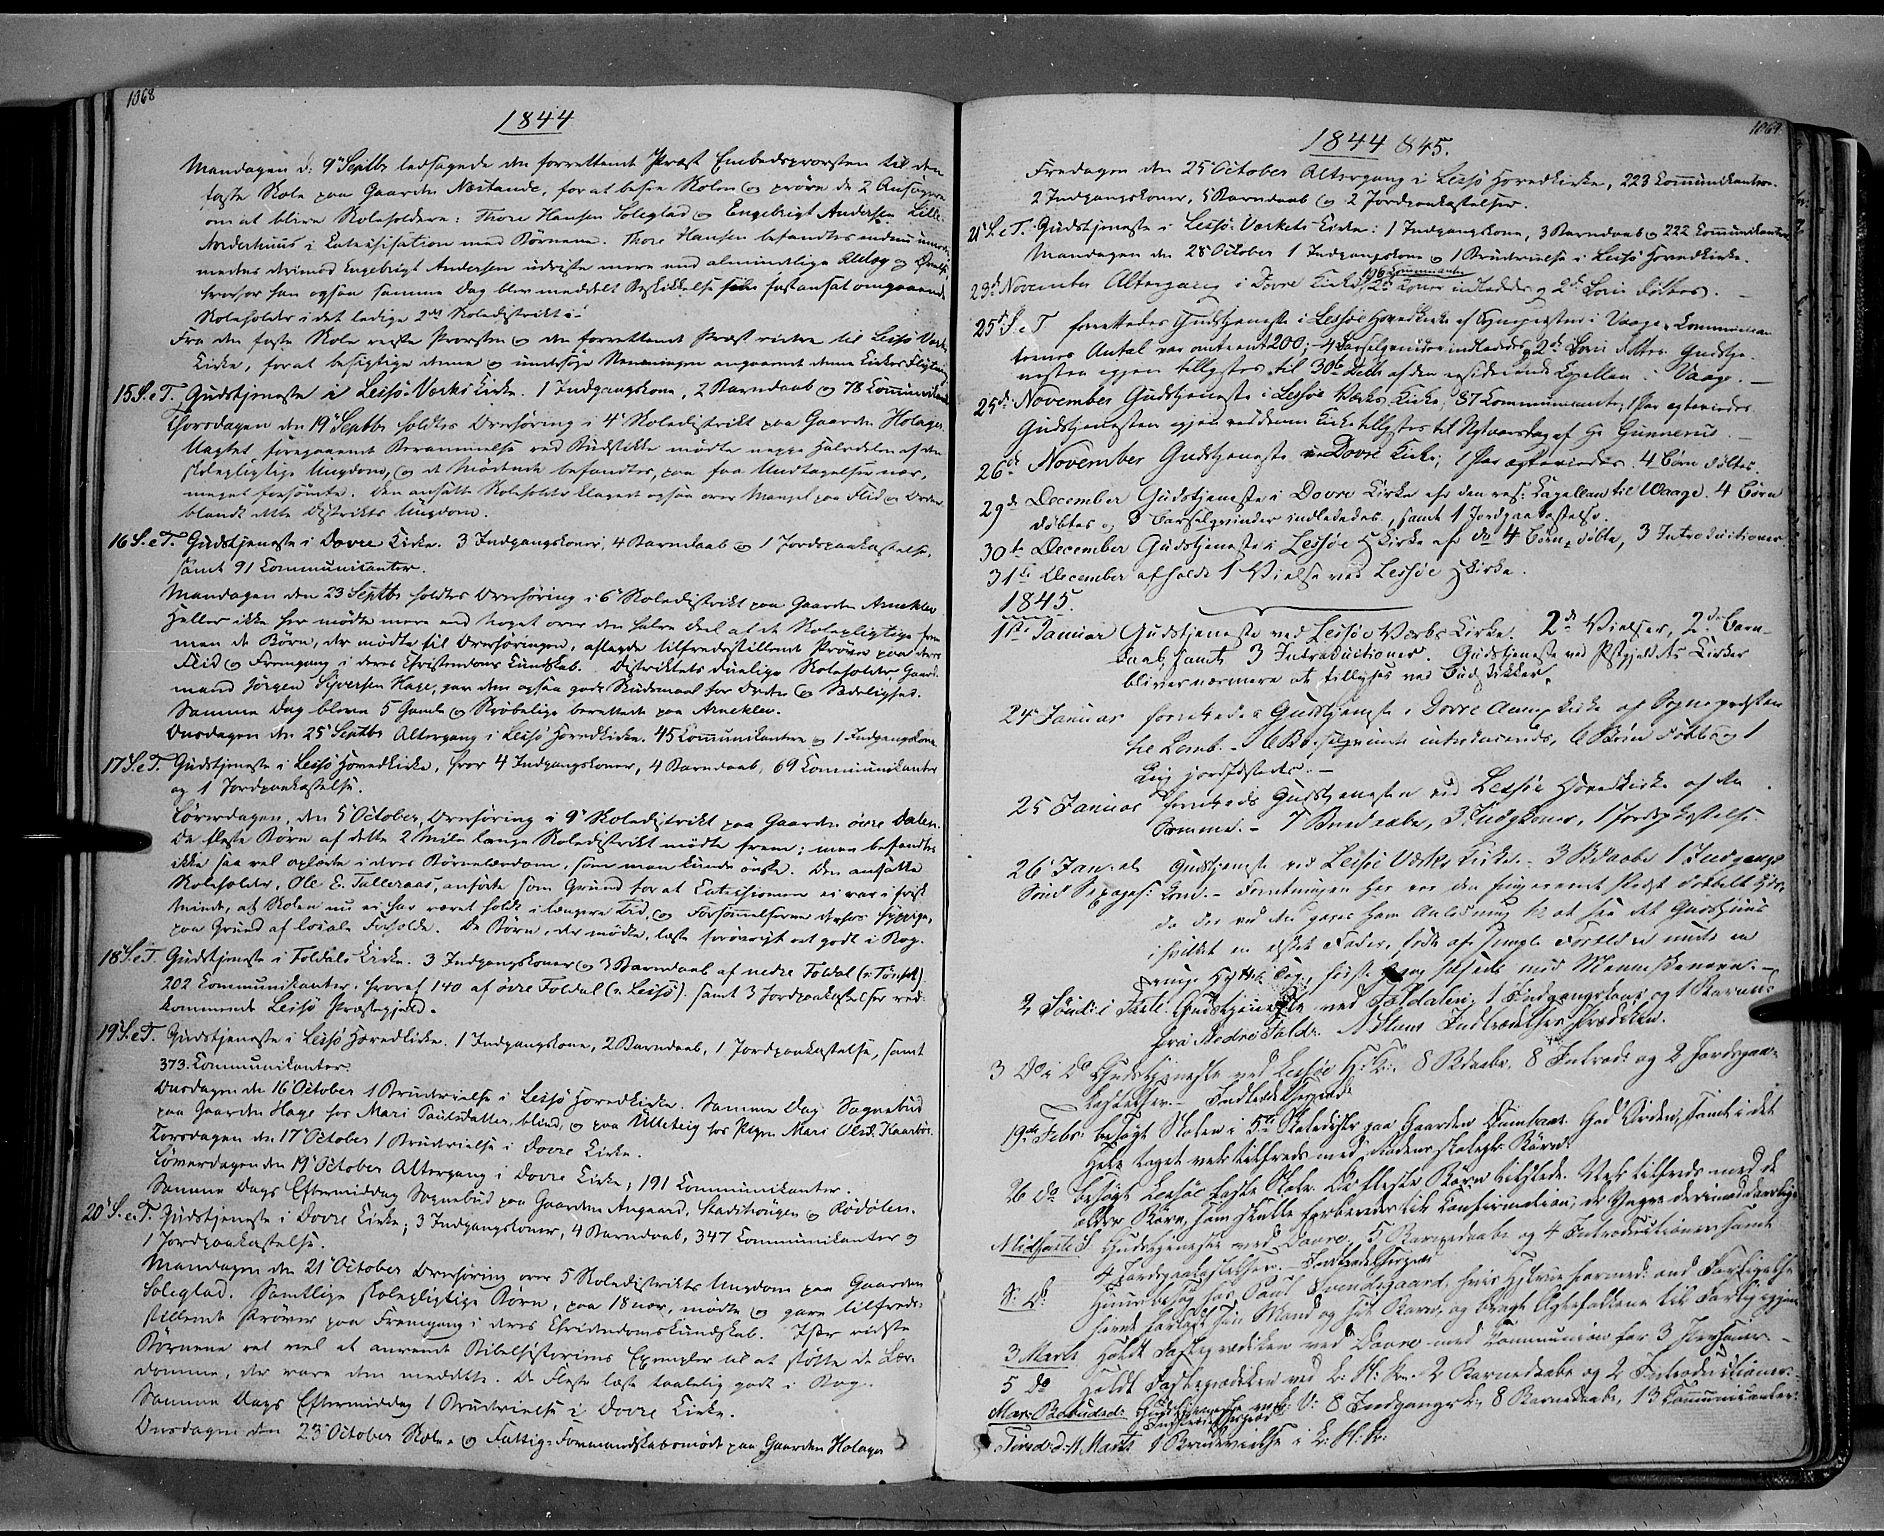 SAH, Lesja prestekontor, Ministerialbok nr. 6B, 1843-1854, s. 1068-1069